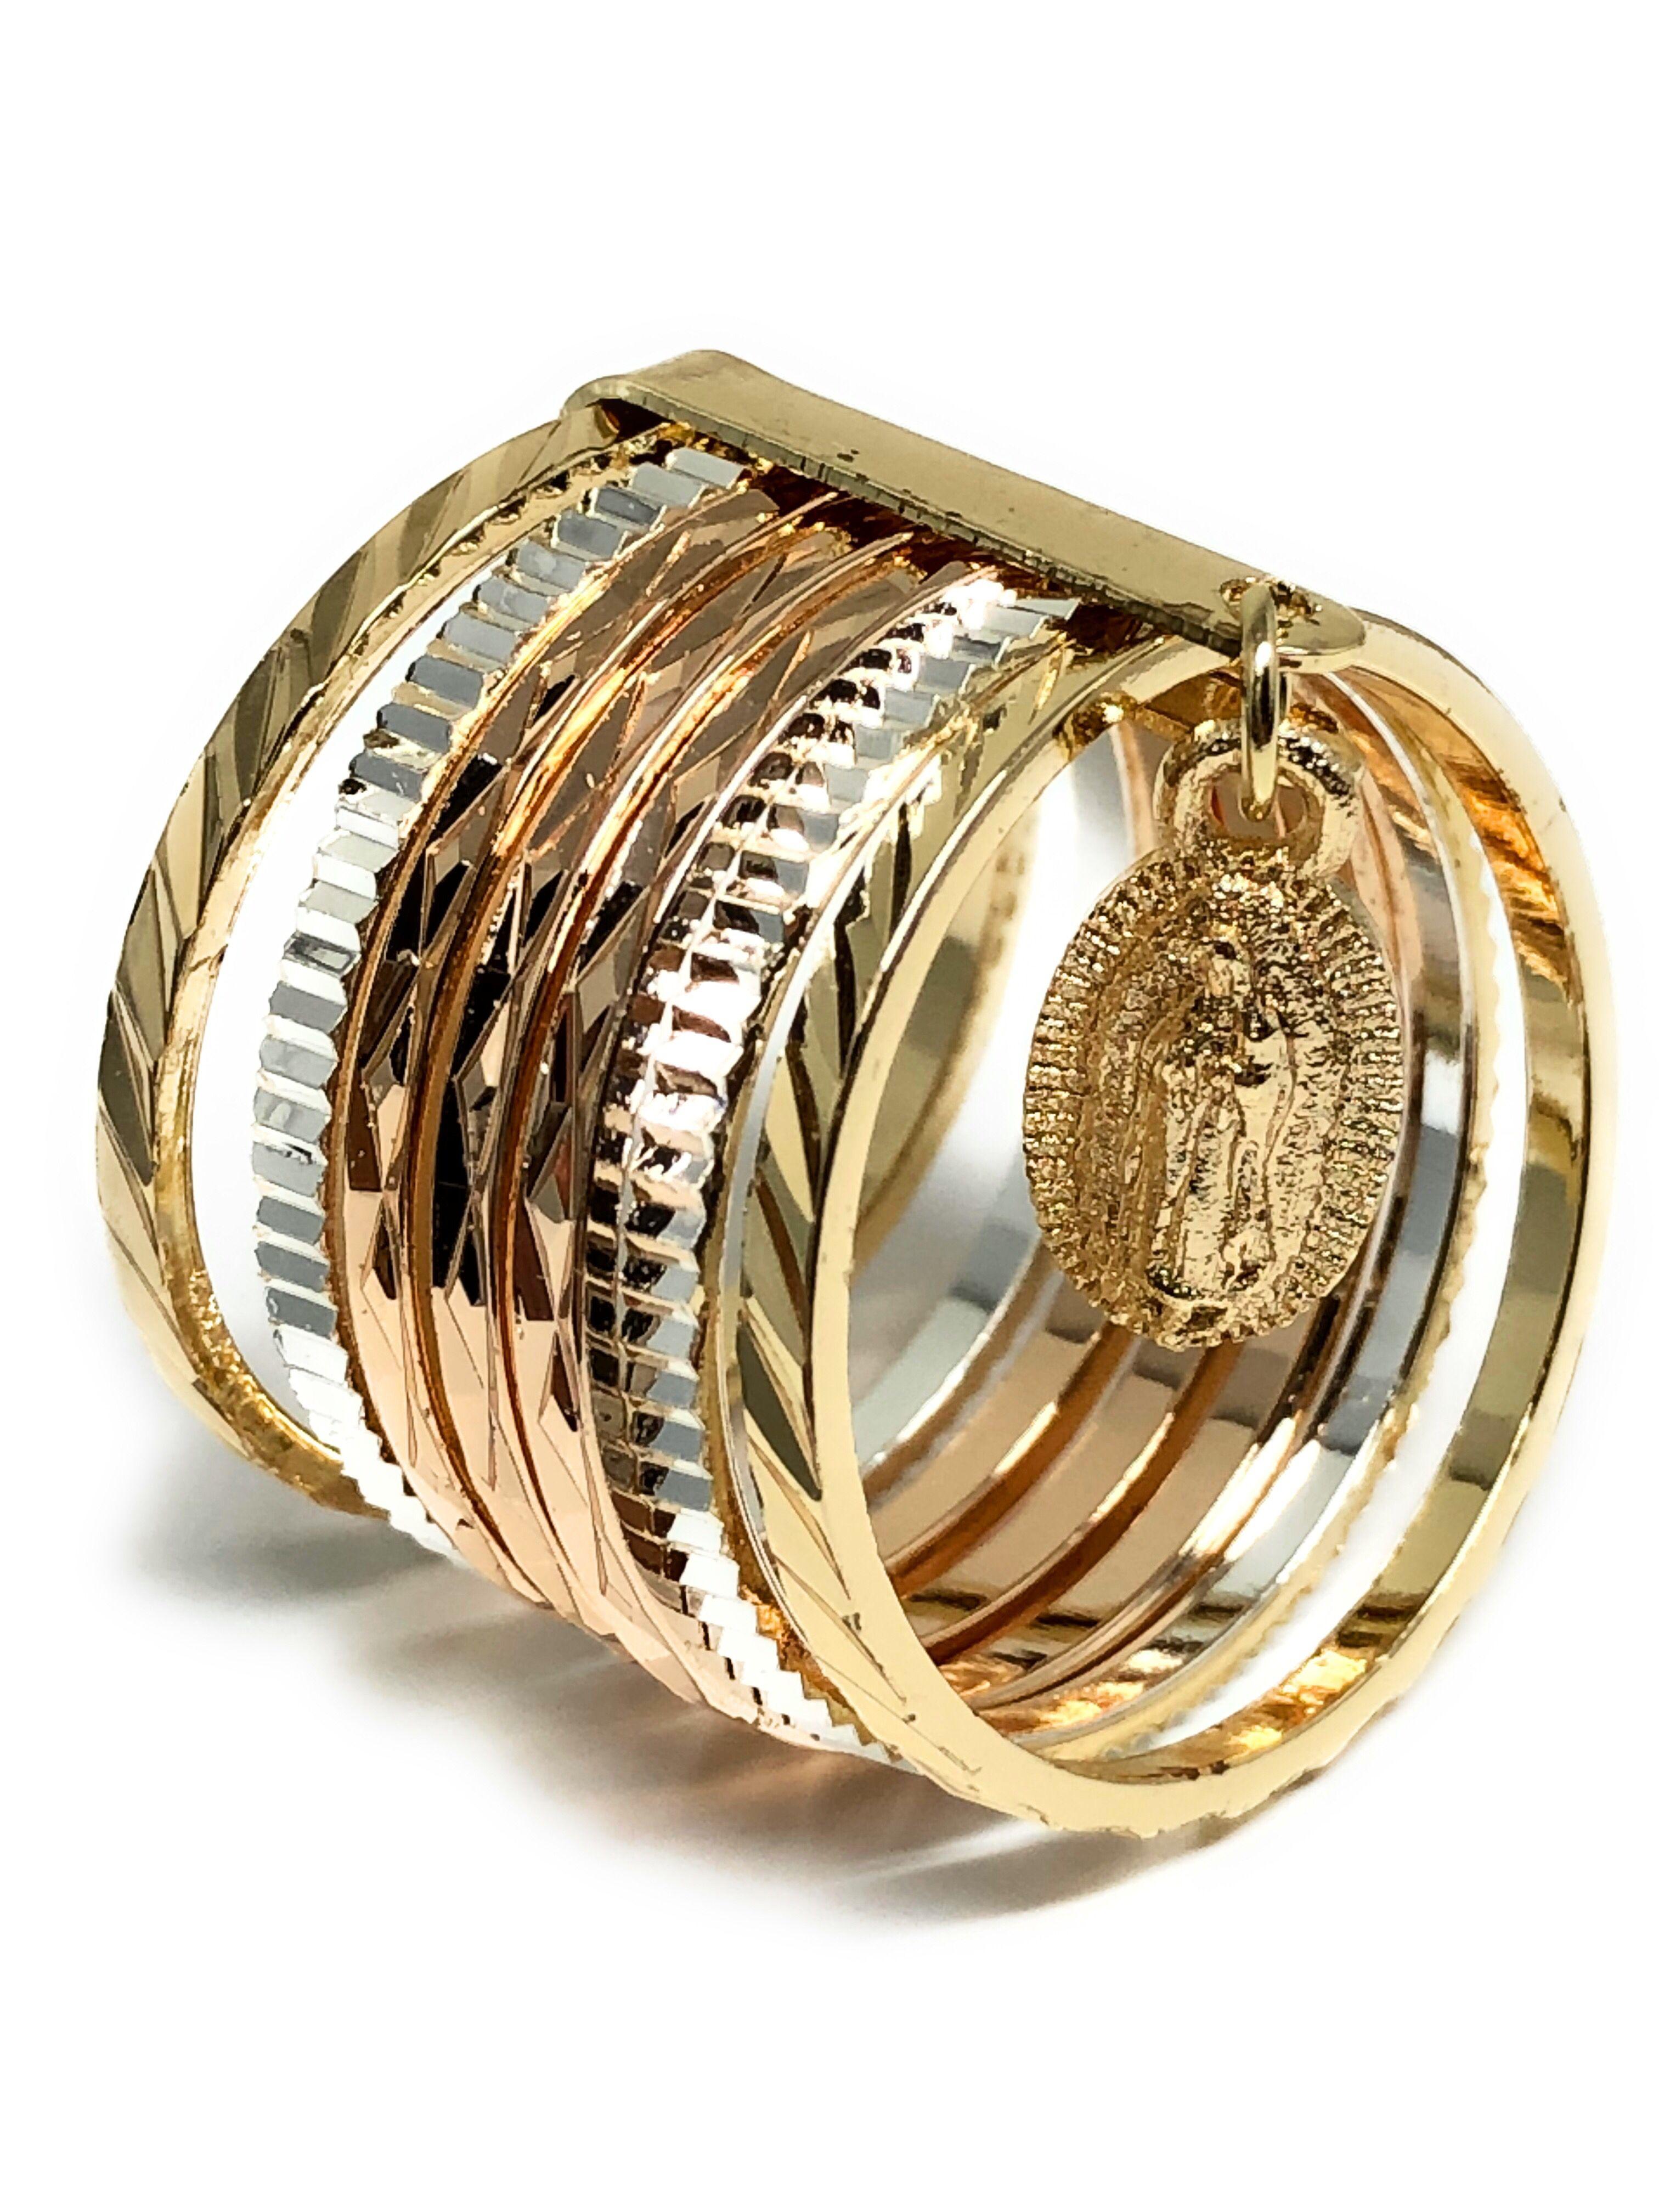 Boutique en ligne 57e67 1dd47 Tri-Color Gold Plated Semanario Virgin Mary Ring Virgen De ...